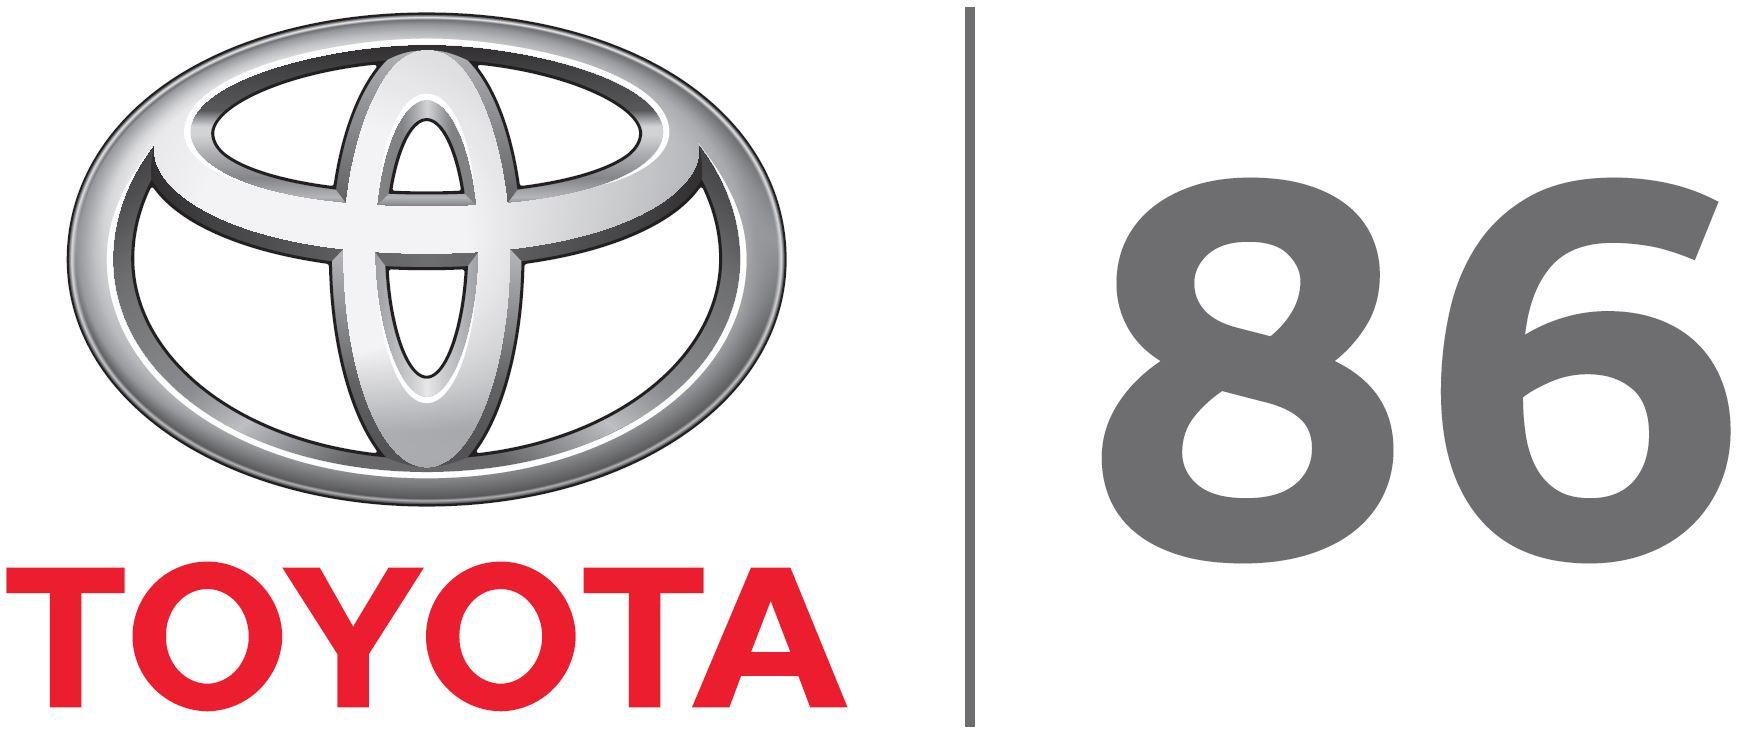 86 logo